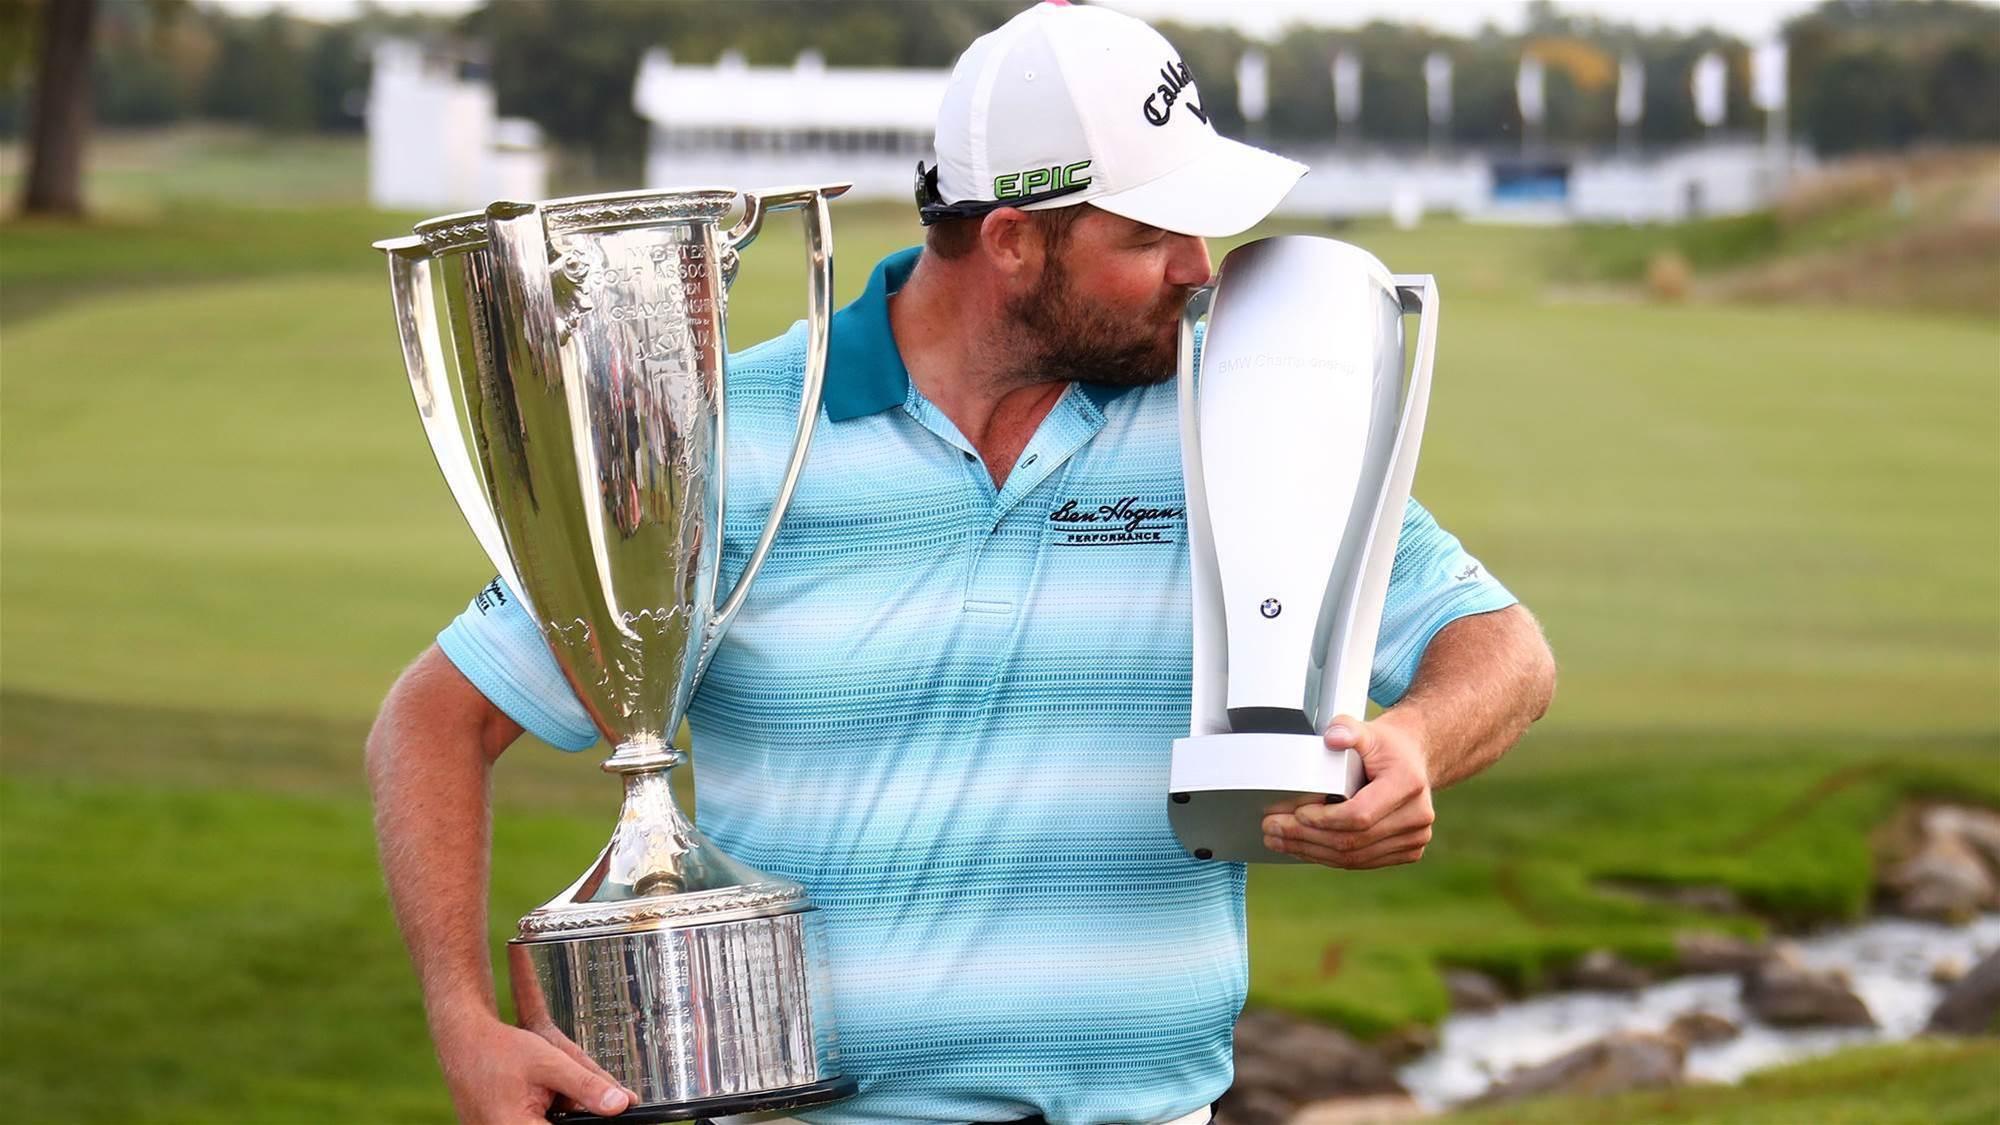 PGA TOUR: Leishman romp puts him in $10 million frame